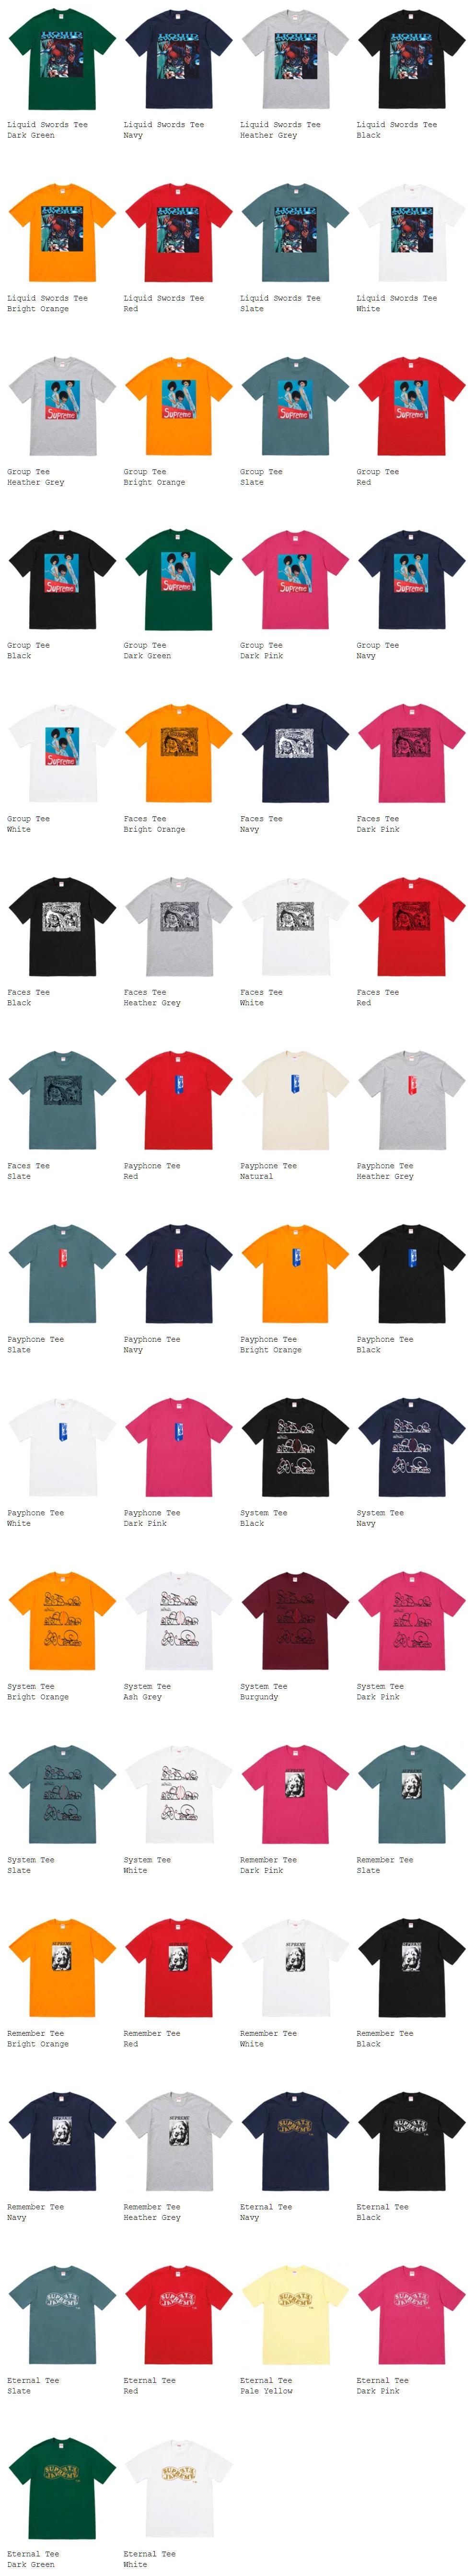 Supreme シュプリーム 18fw week5 Tシャツ